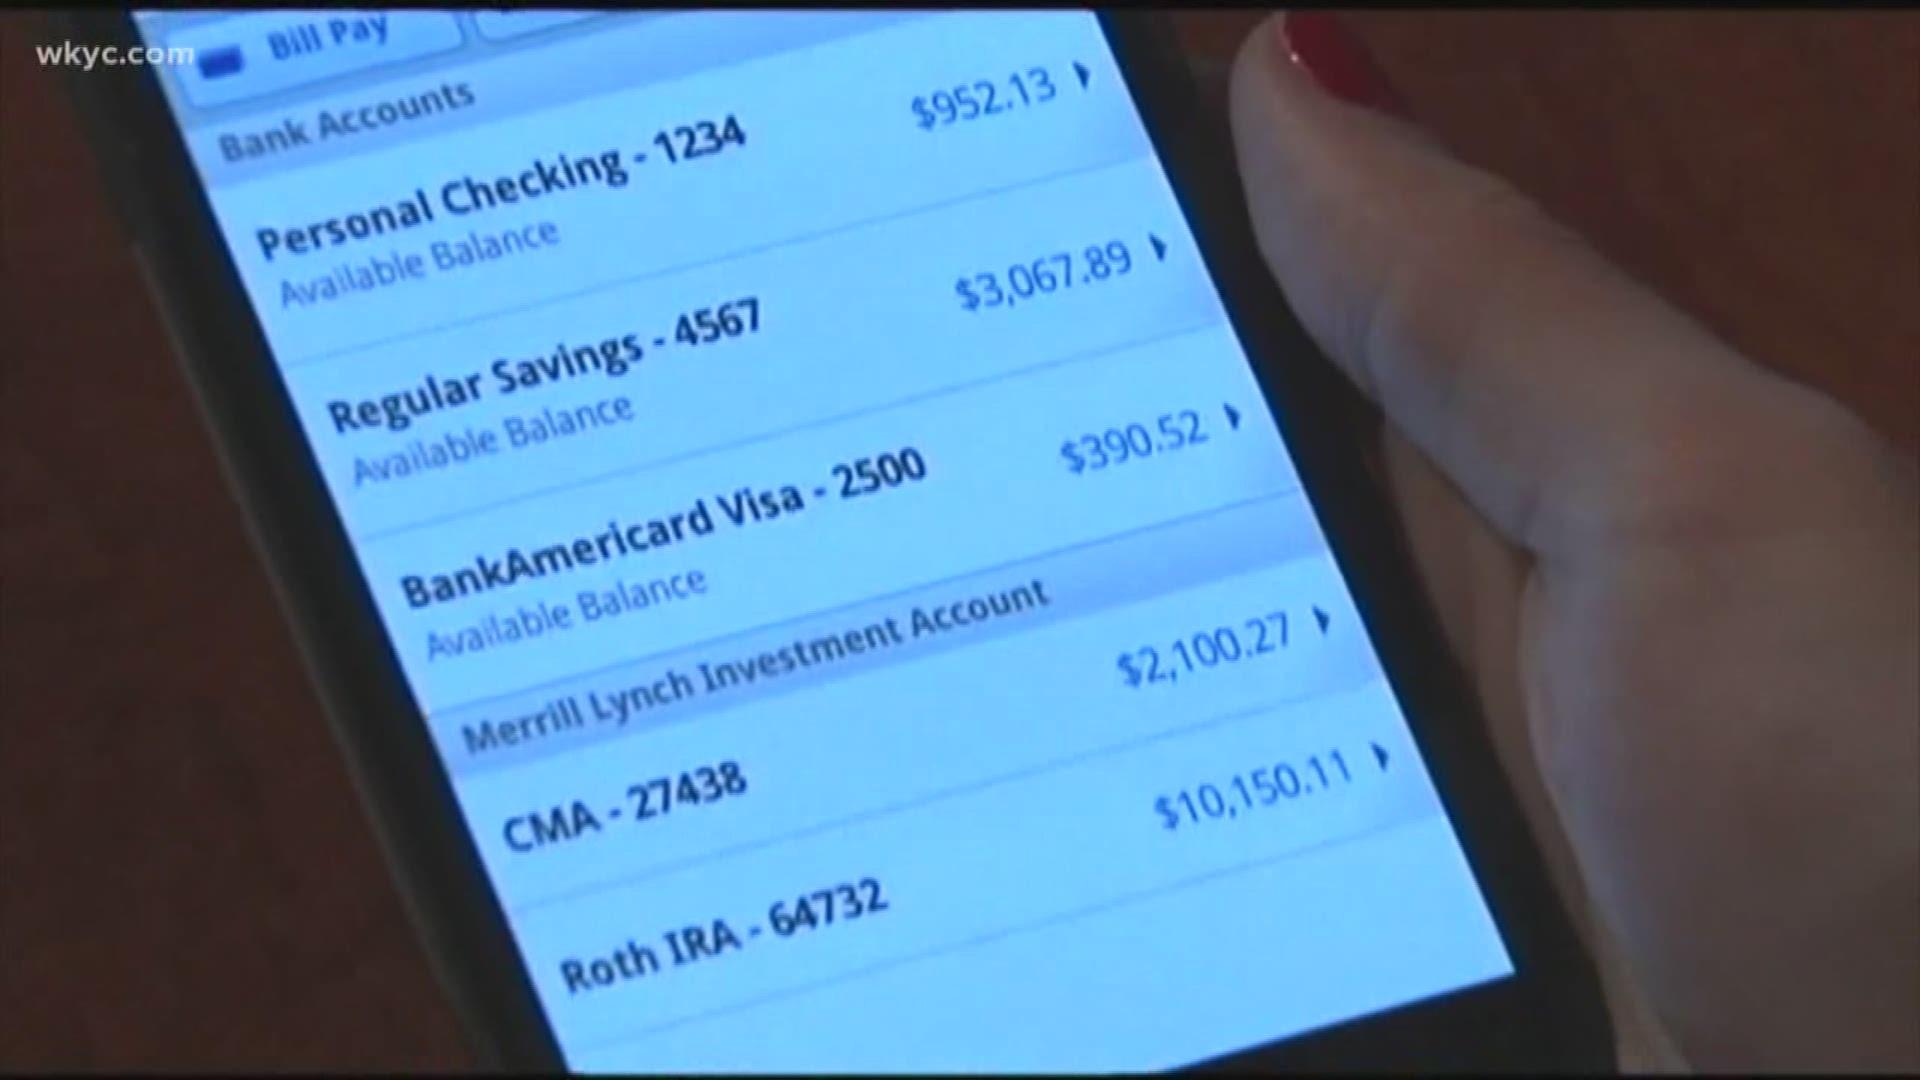 Scammers Target Cash App A Popular Peer To Peer Mobile Payment App Wkyc Com